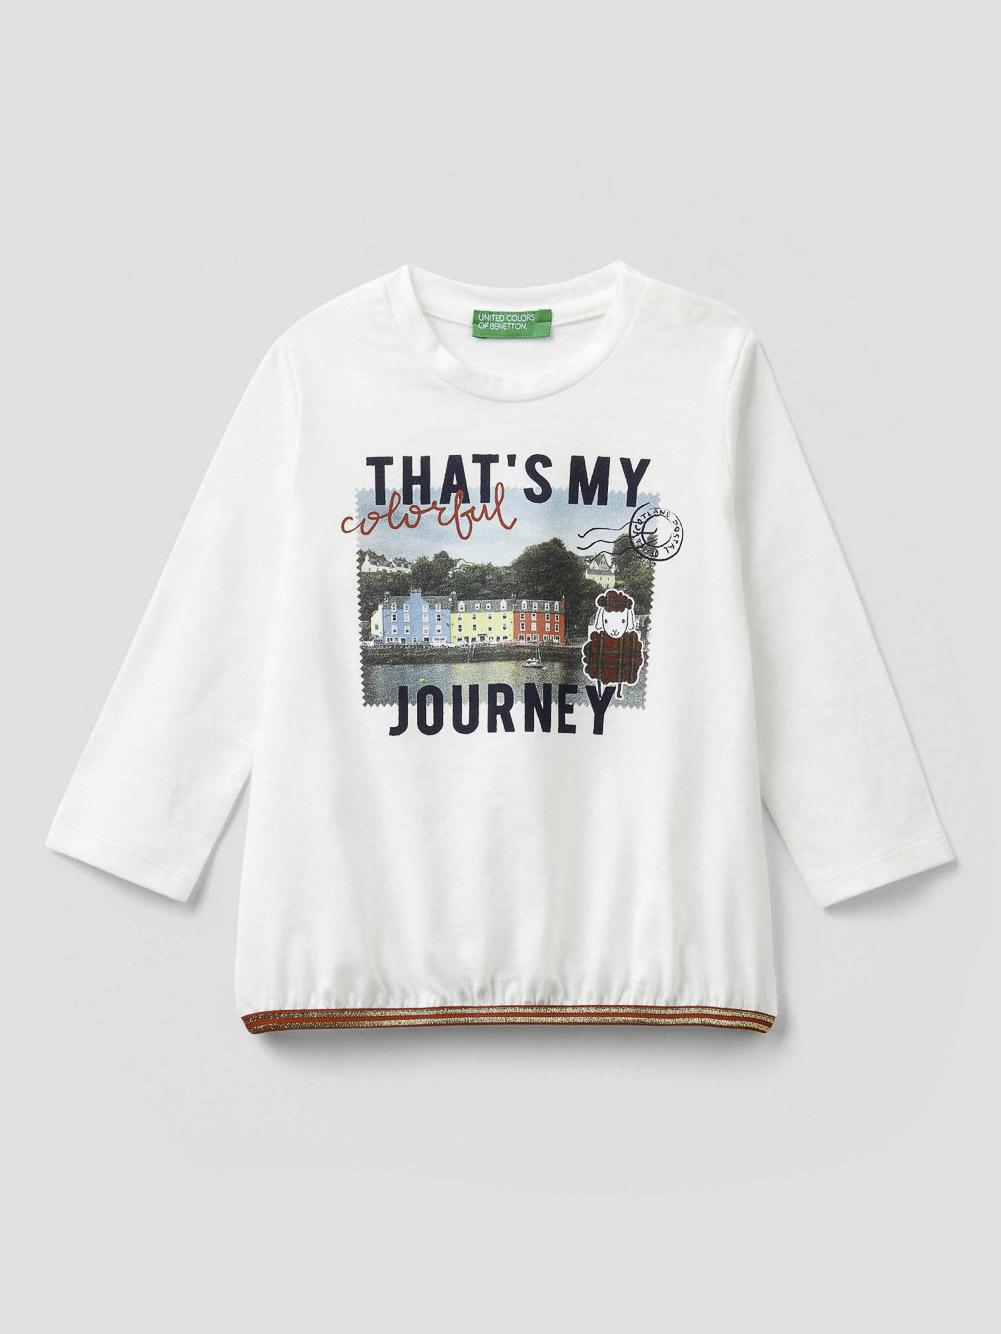 012 BENETTON T-shirt με τύπωμα καρτ ποστάλ 3VR5C14TW 20A074